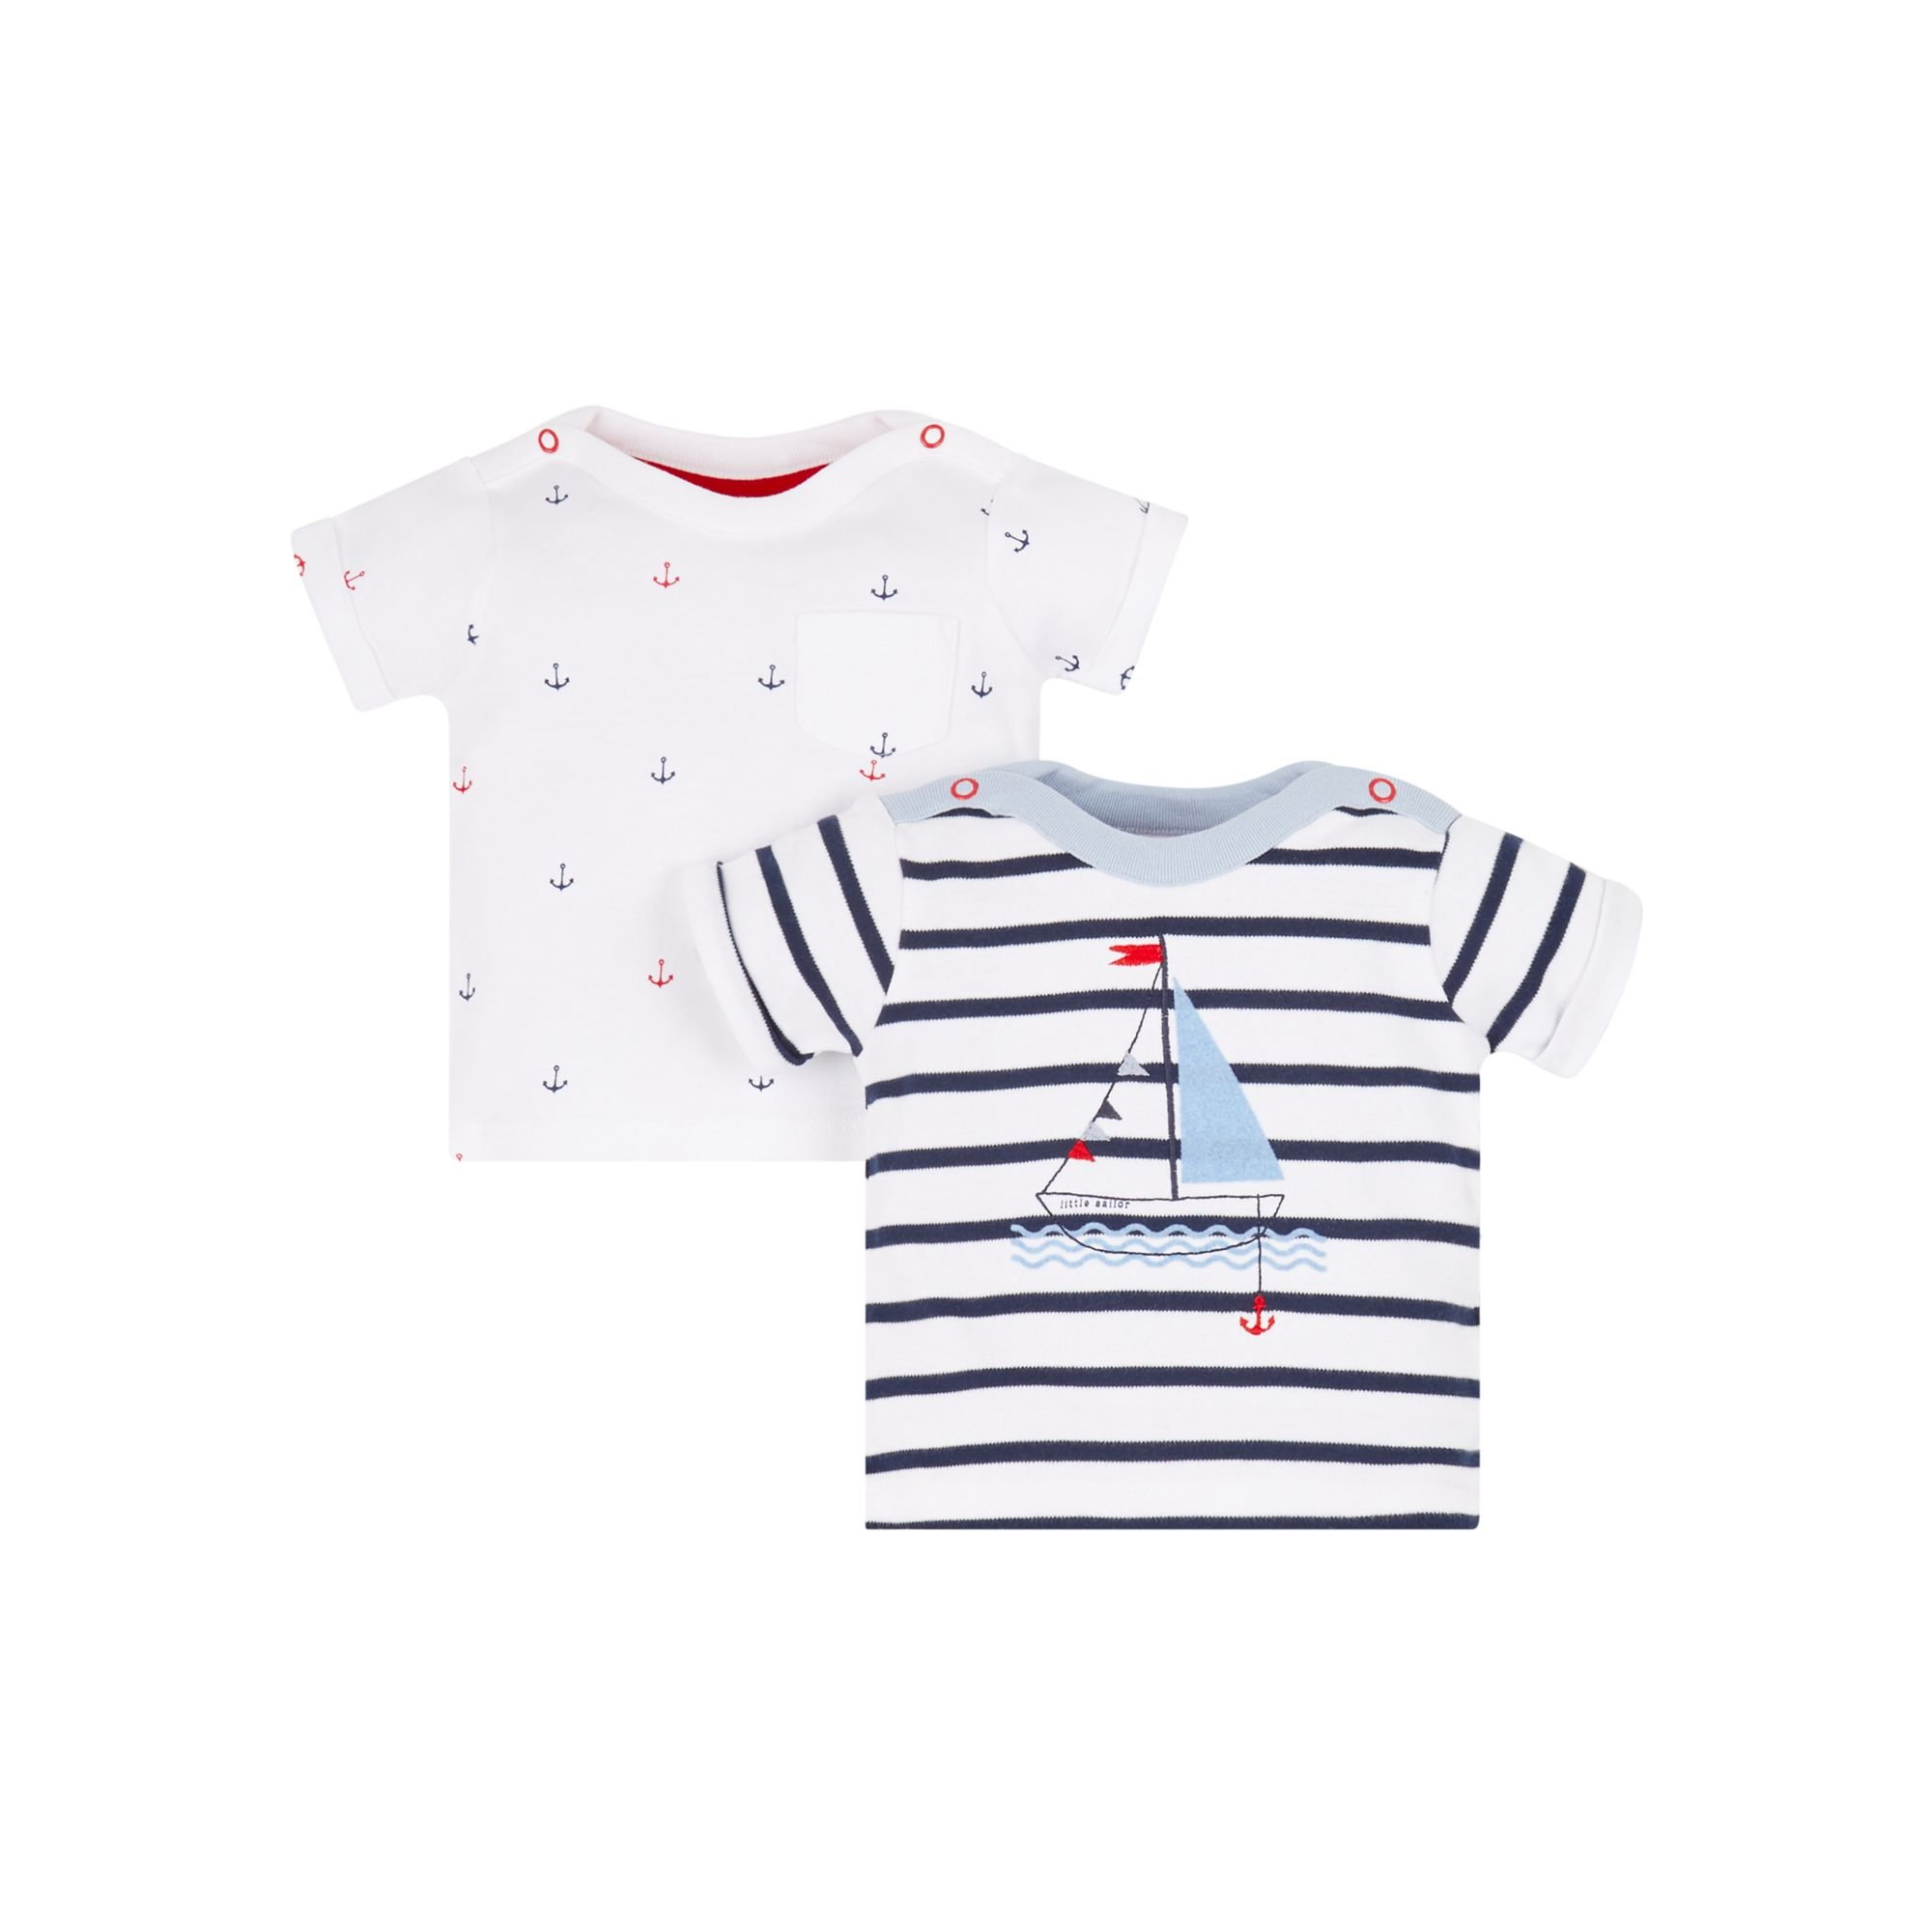 Kolylong 2 Pairs Cute Cartoon Baby Infant Boys Gitls Anti Scratch Mittens Soft Newborn Gloves Gift